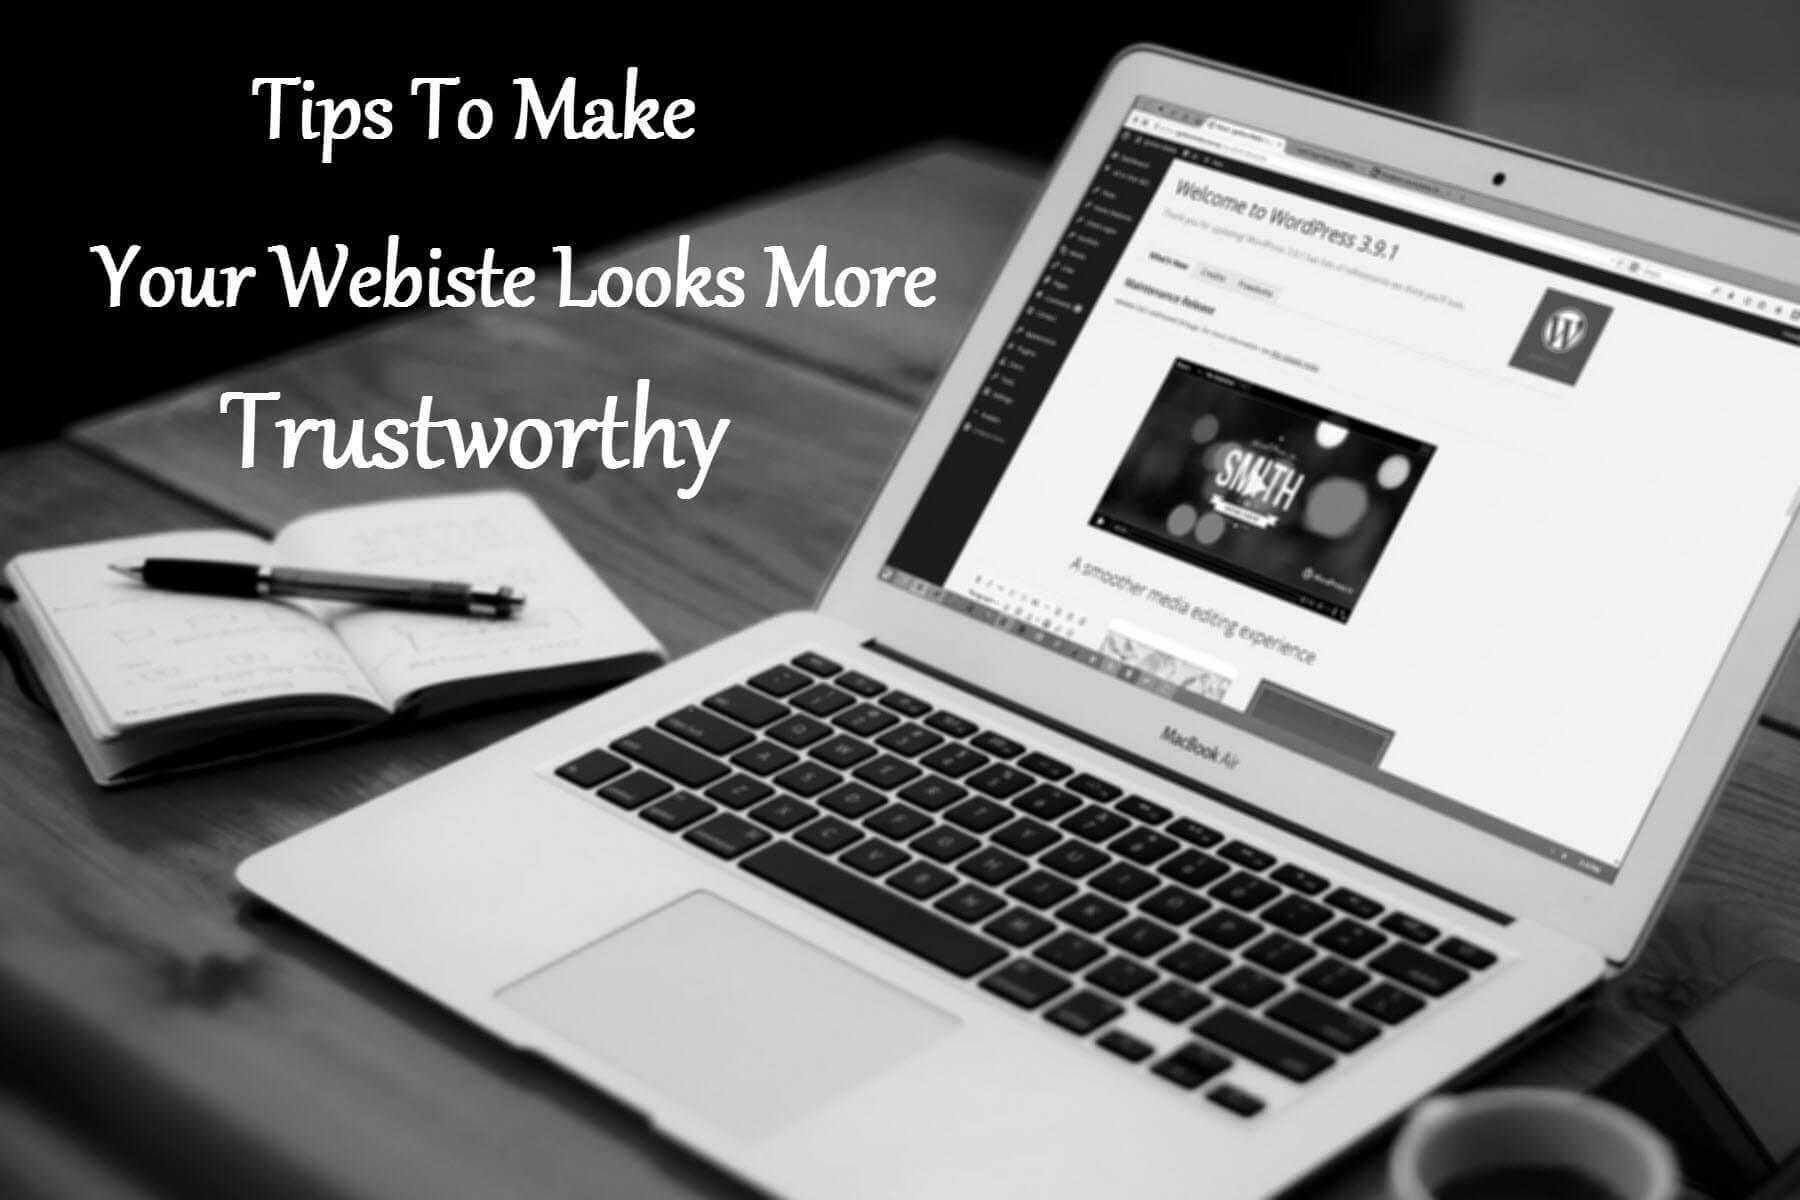 Trustworthy-website